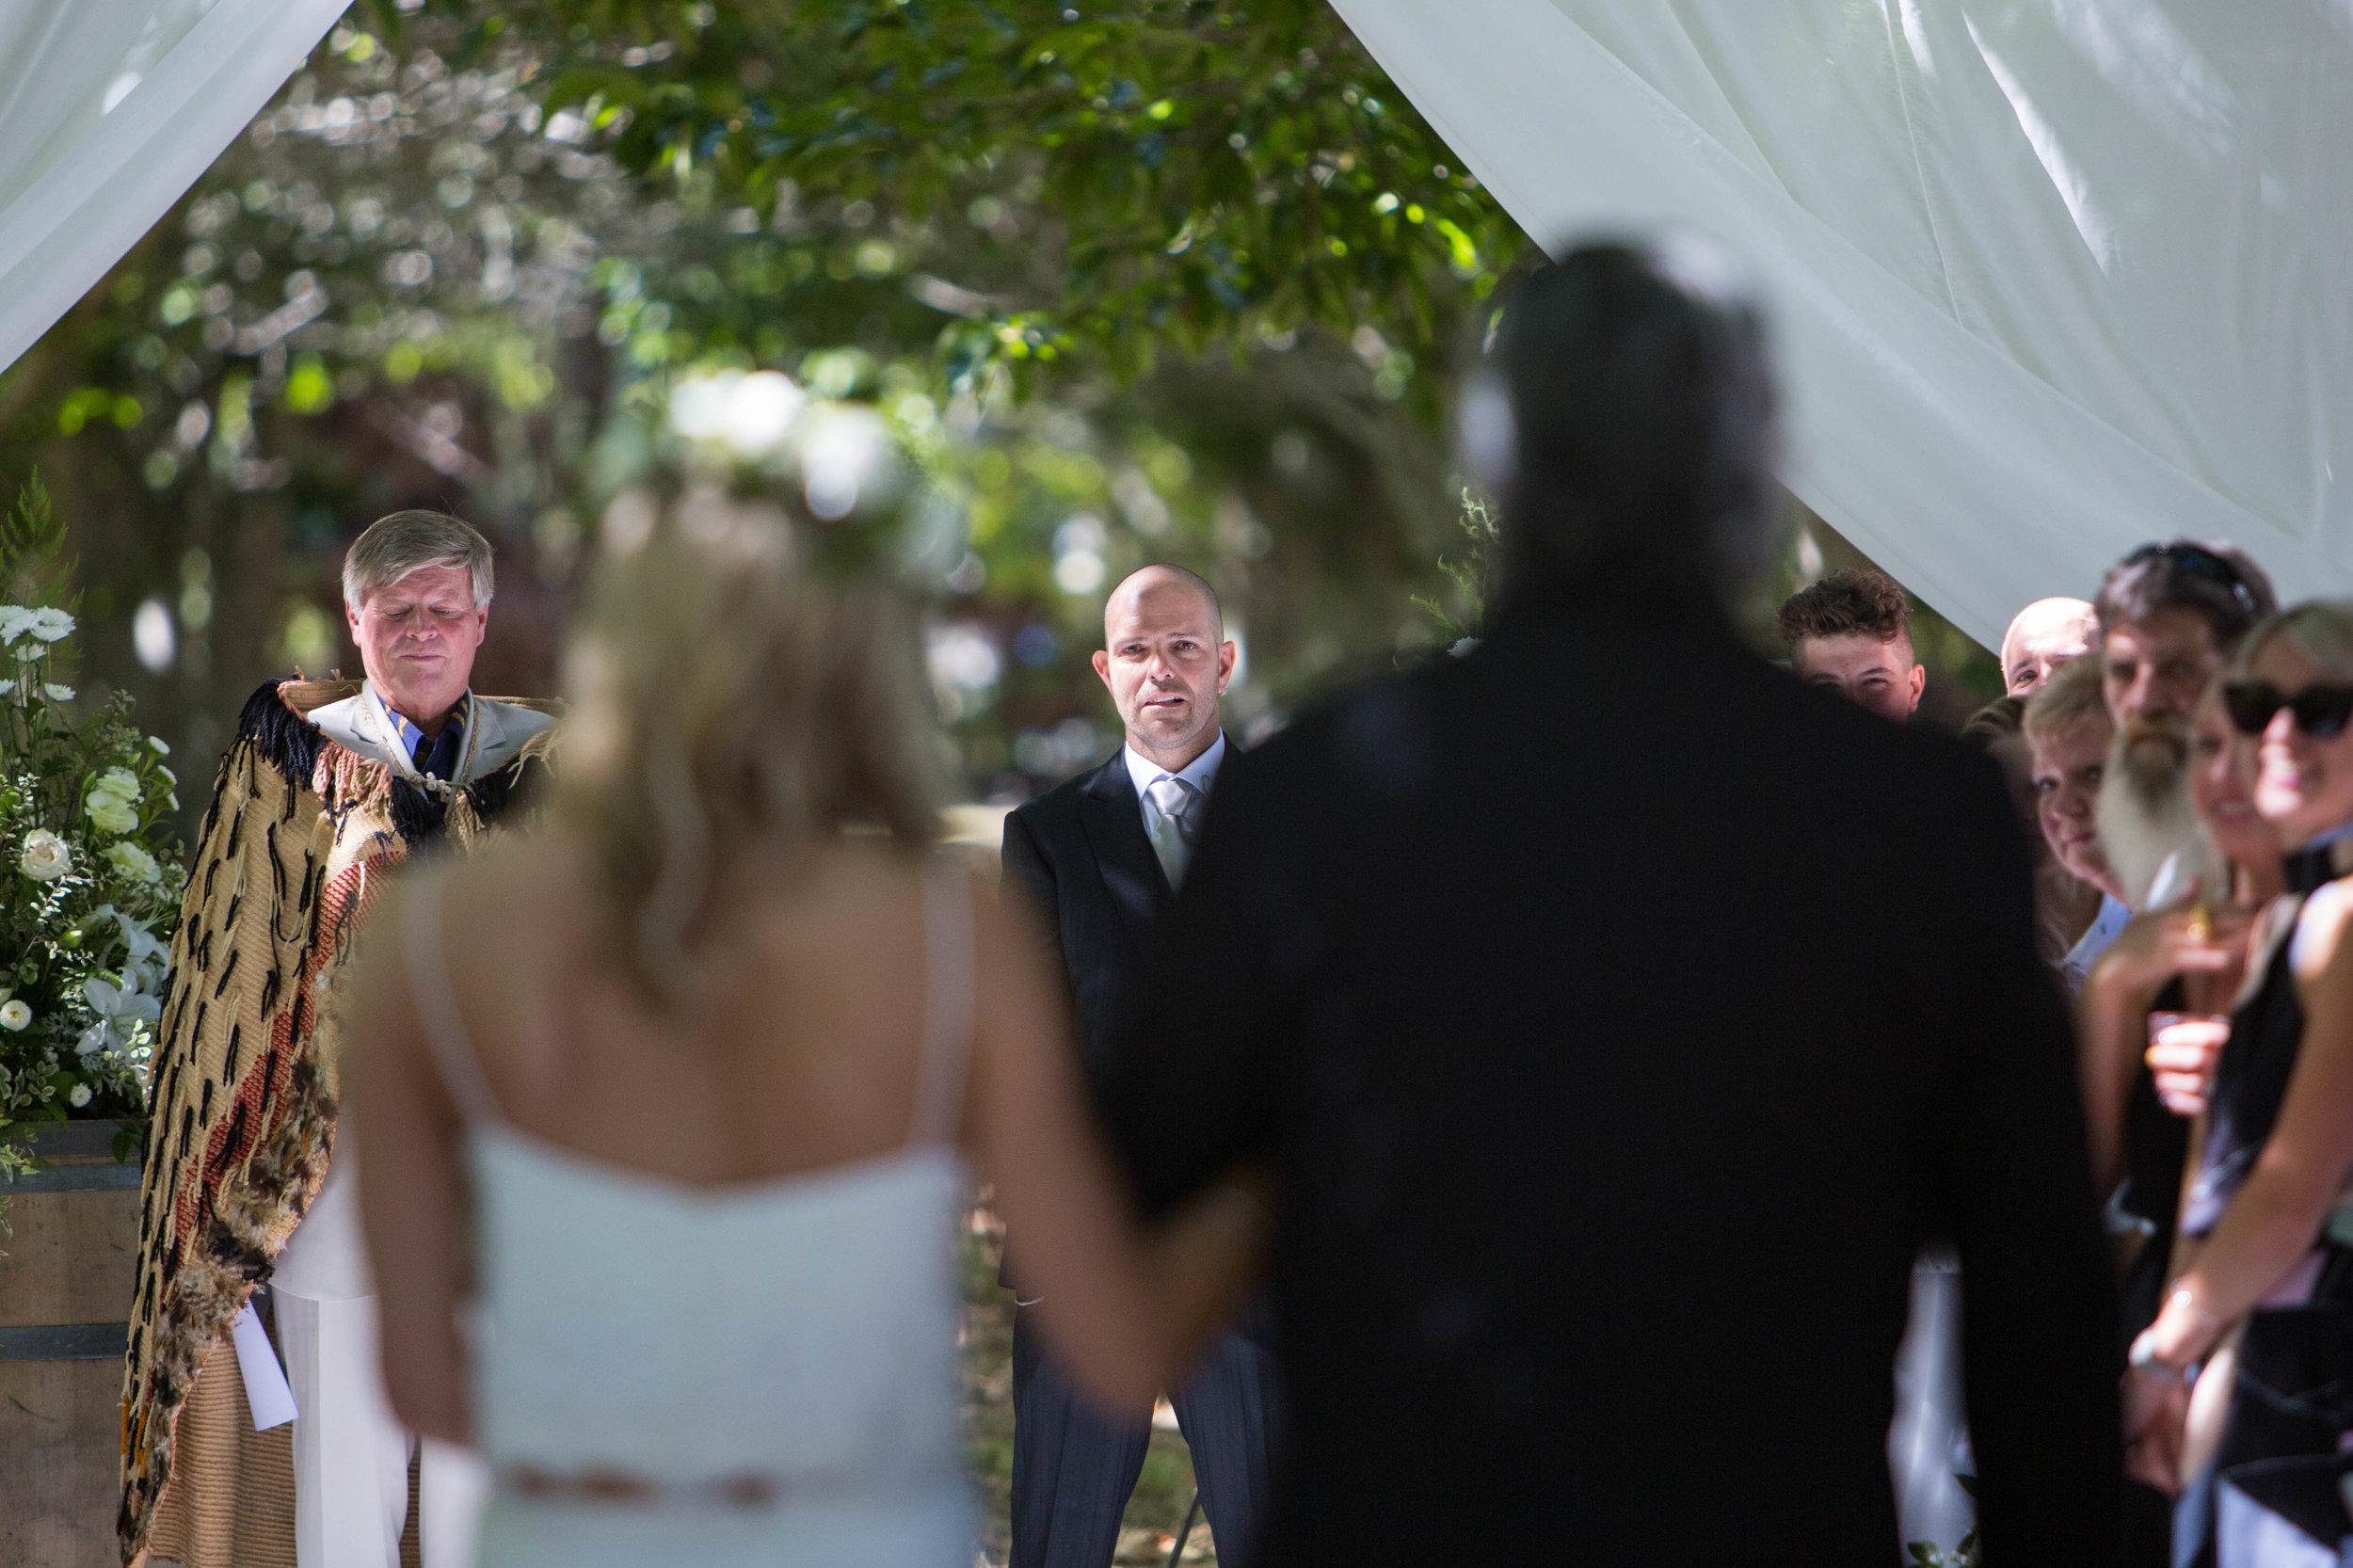 wedding-ceremony-7.jpg